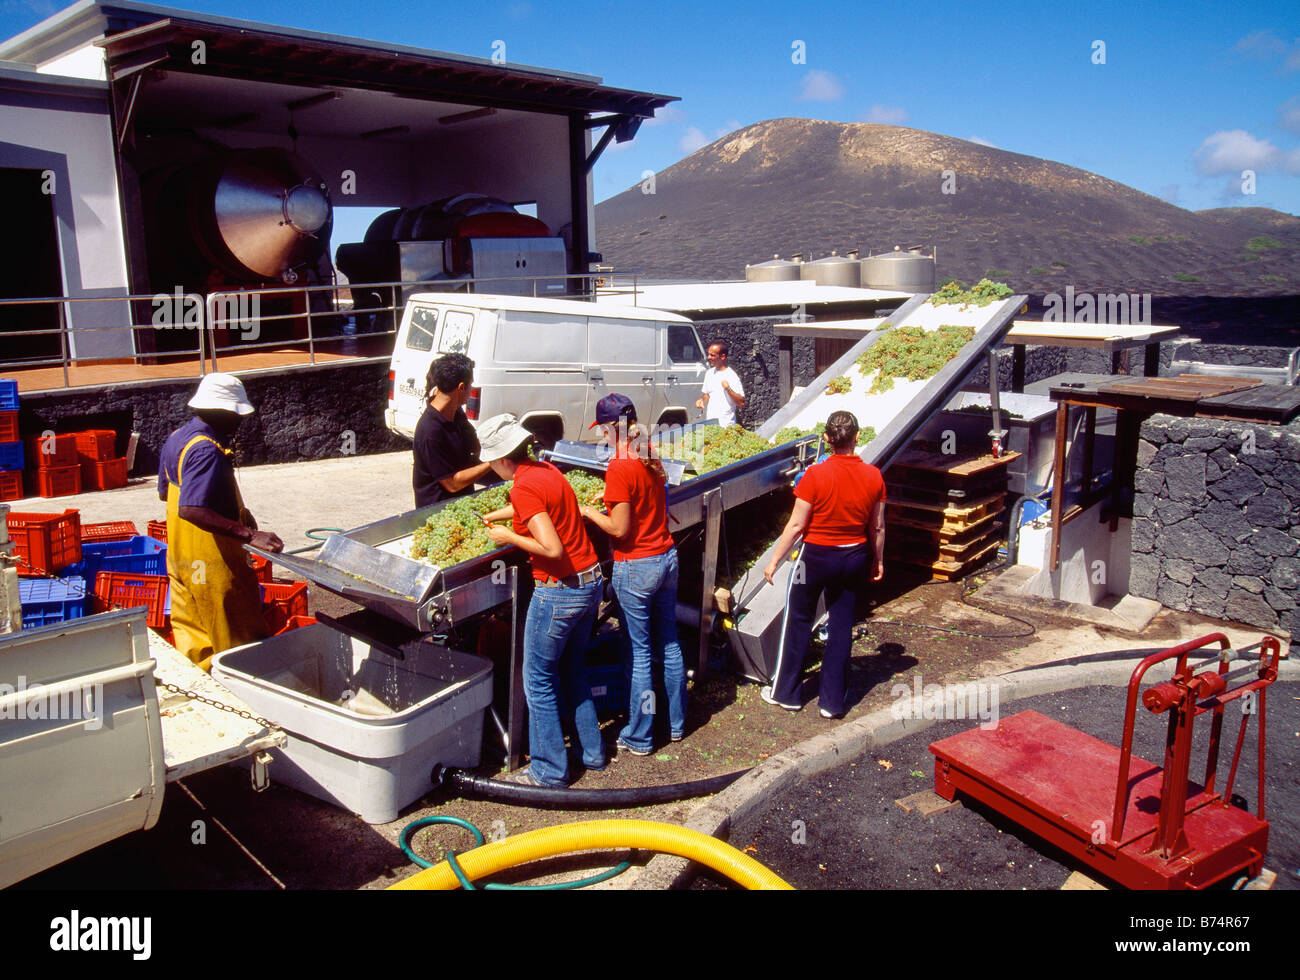 Grape pickers in La Geria. Lanzarote island. Canary Islands. Spain. - Stock Image